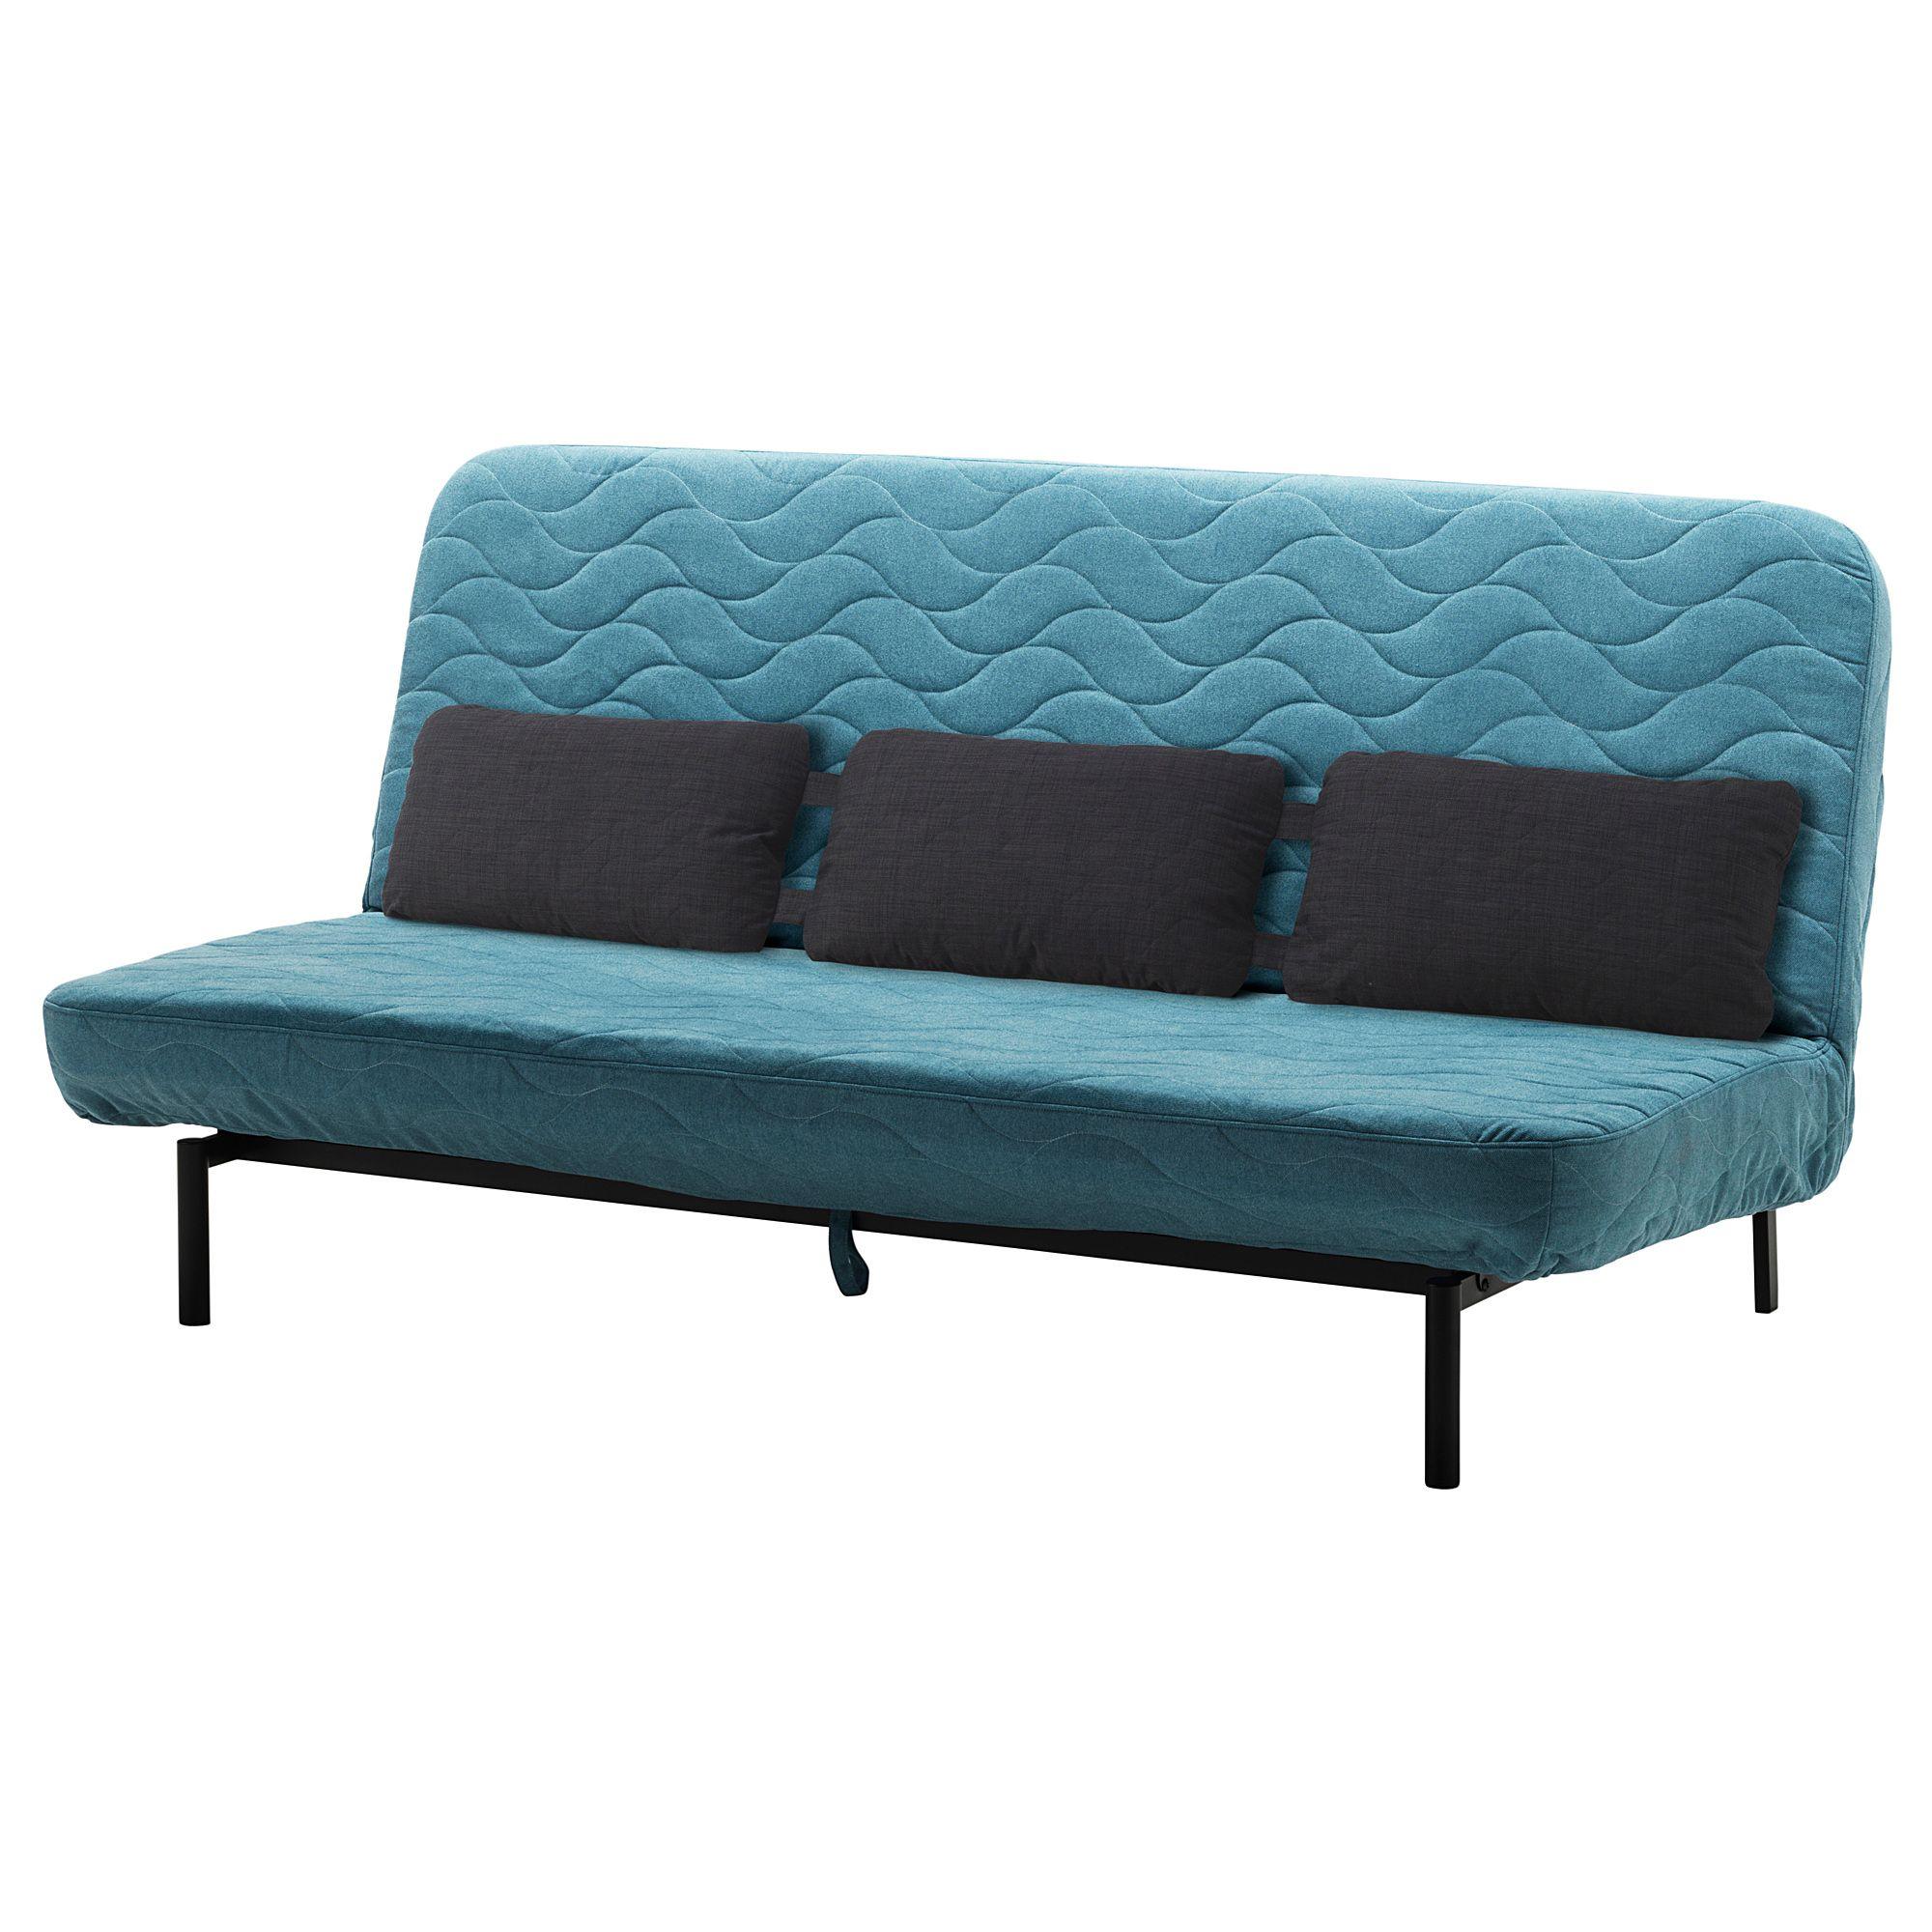 Blauwe Slaapbank Ikea.Furniture And Home Furnishings Ikea Sofa Bed Sleeper Sofa Ikea